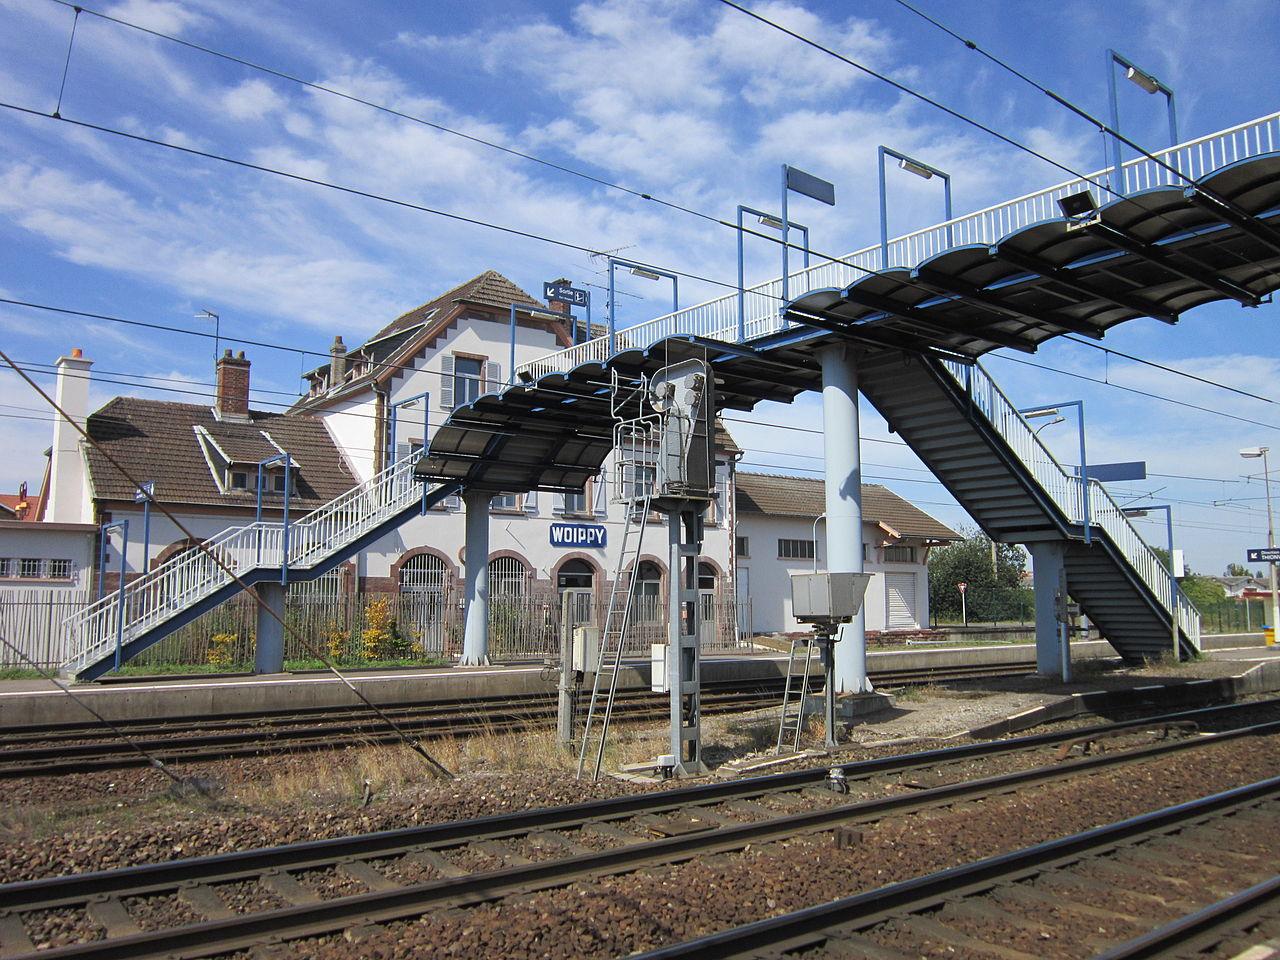 Woippy-train-station